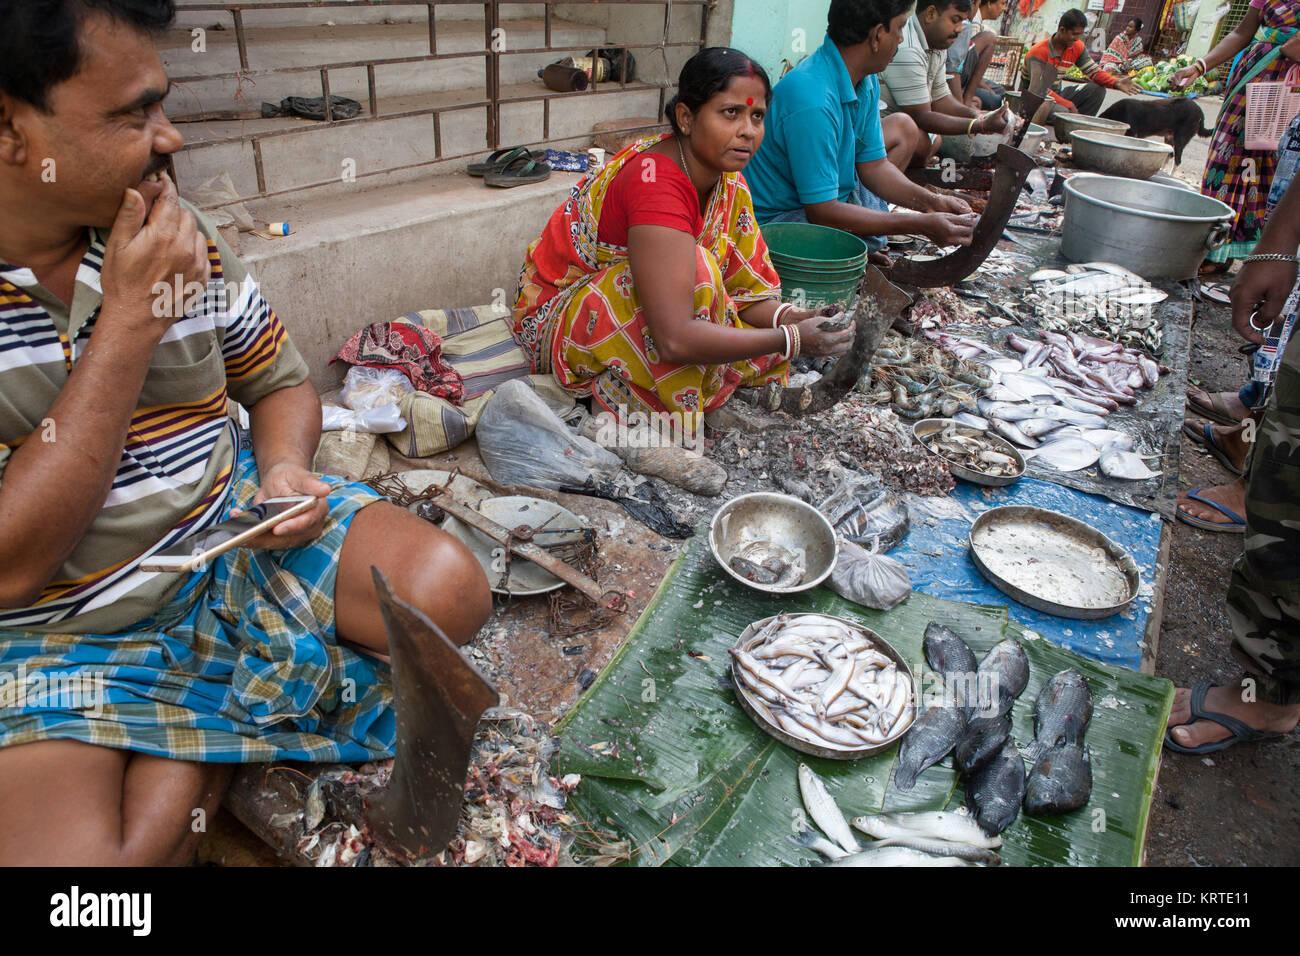 Fish market in the Garia district of Kolkata, India - Stock Image